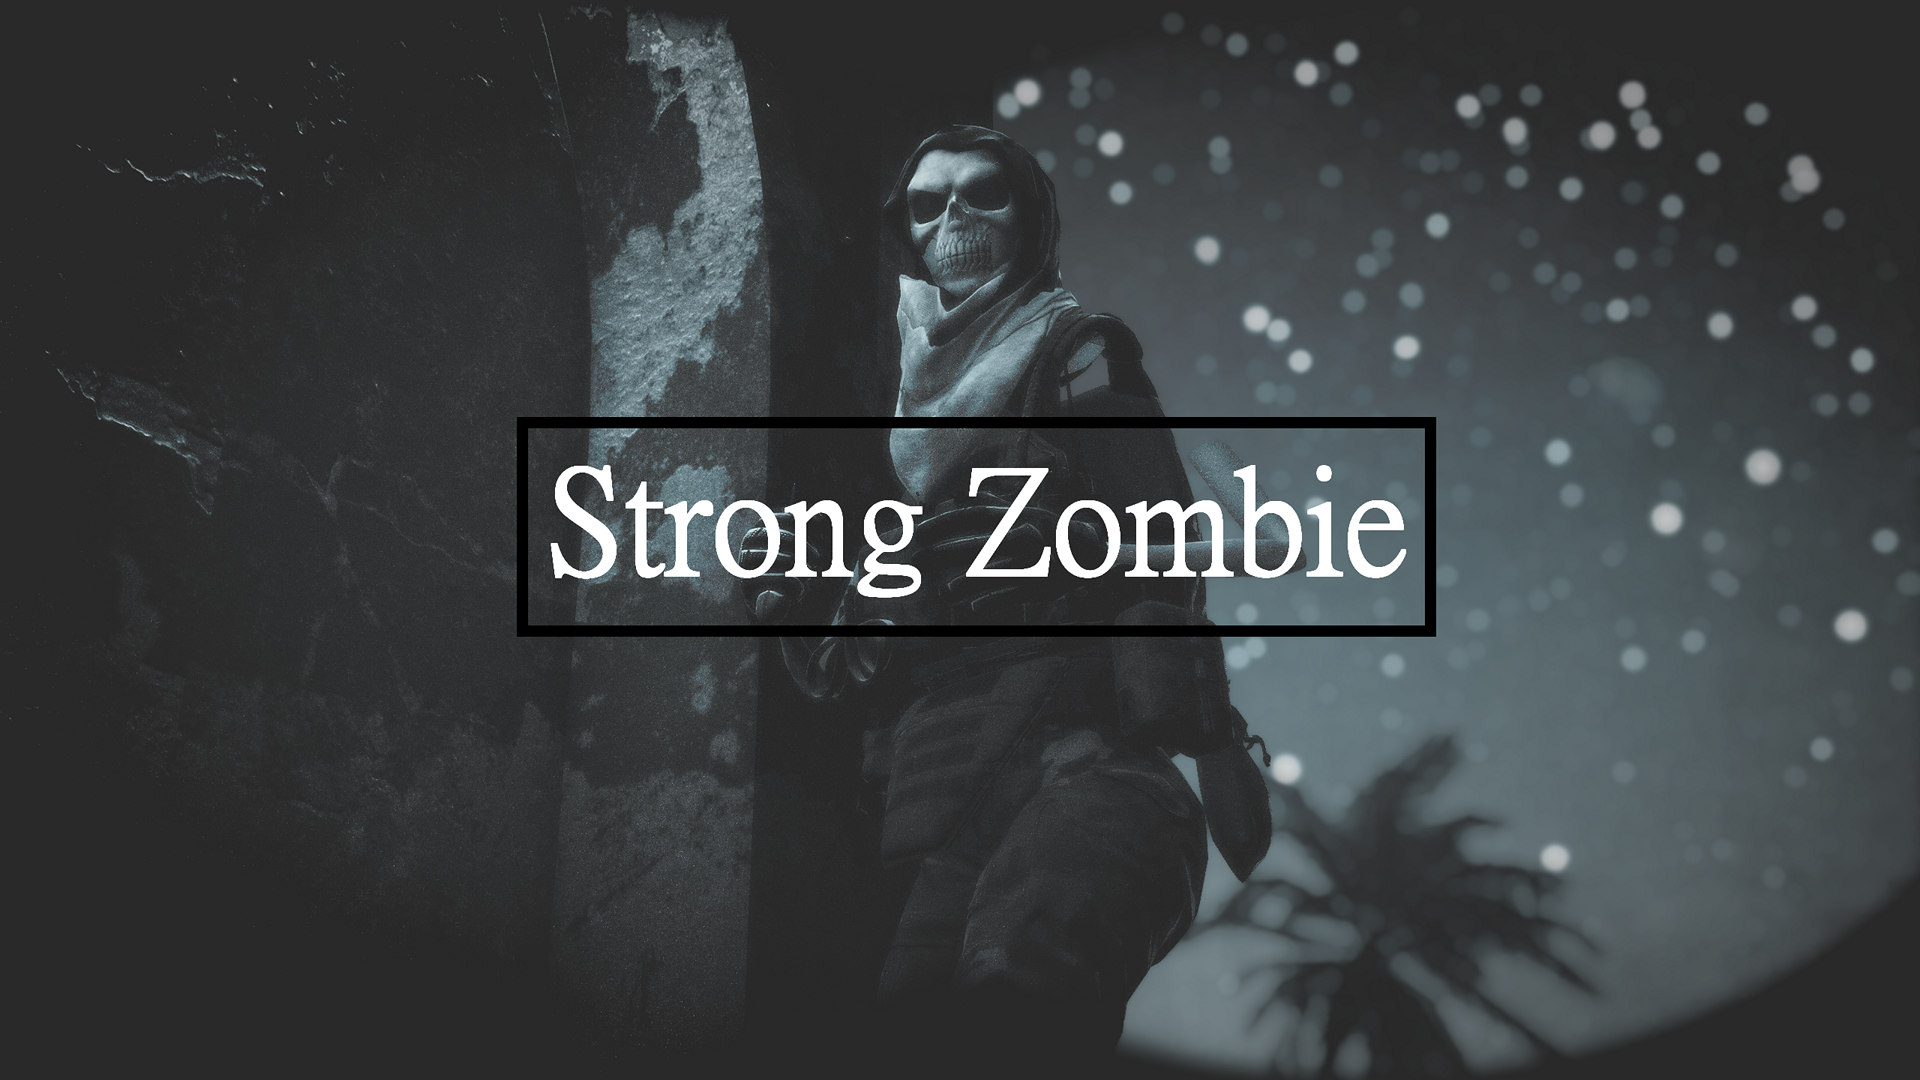 strongzombie